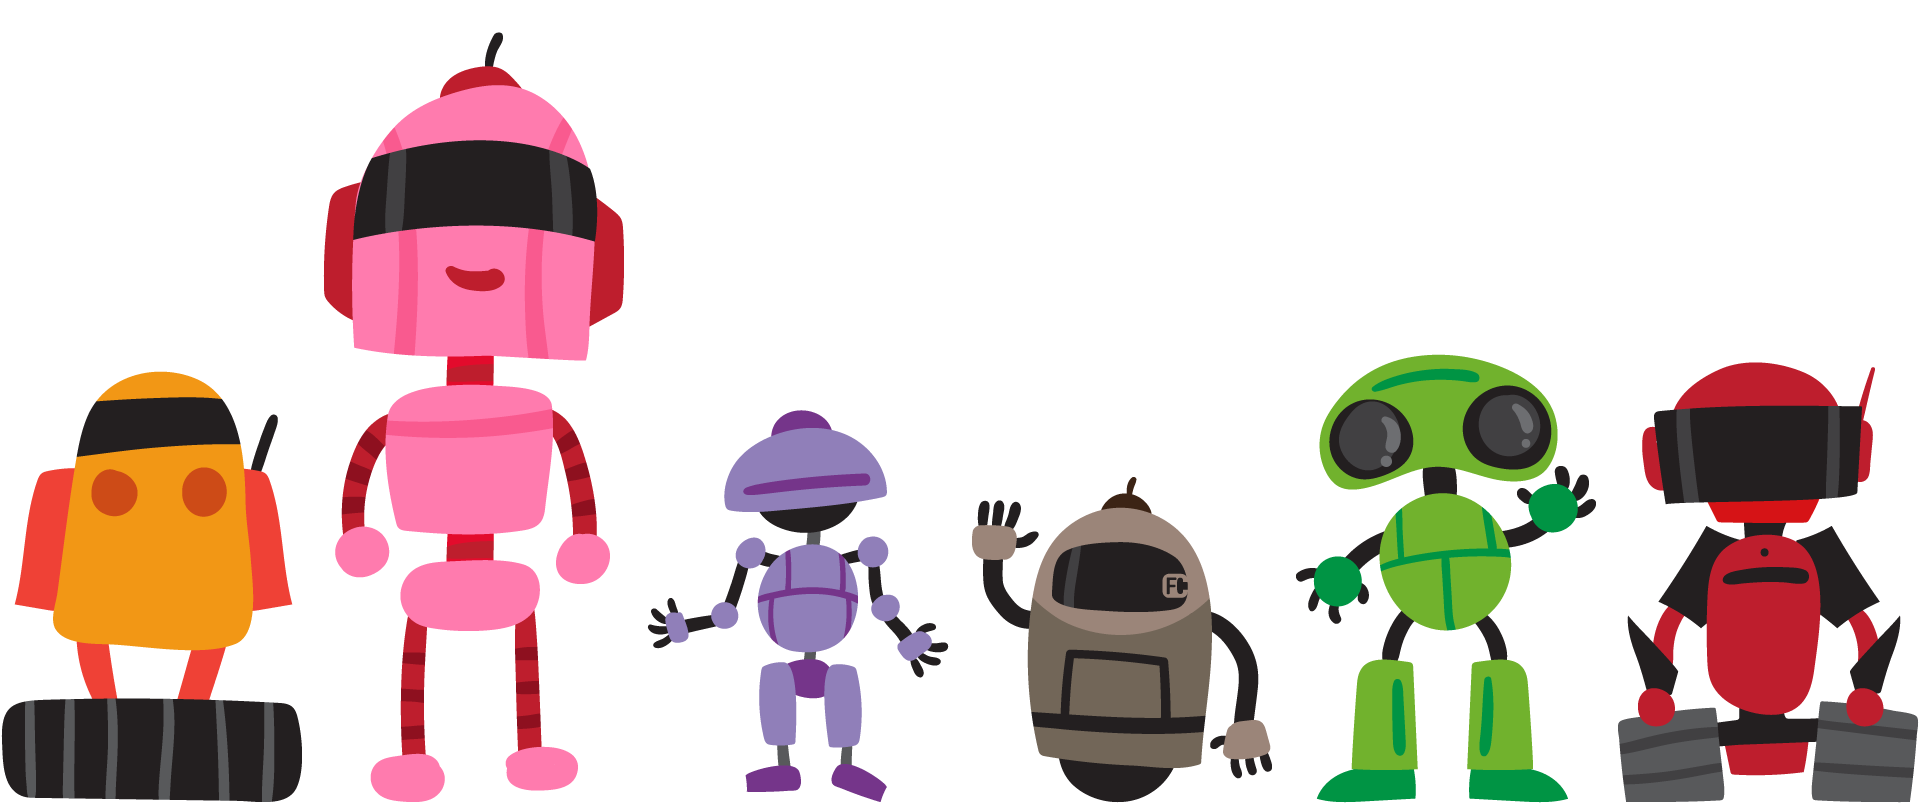 Robots Fllcasts